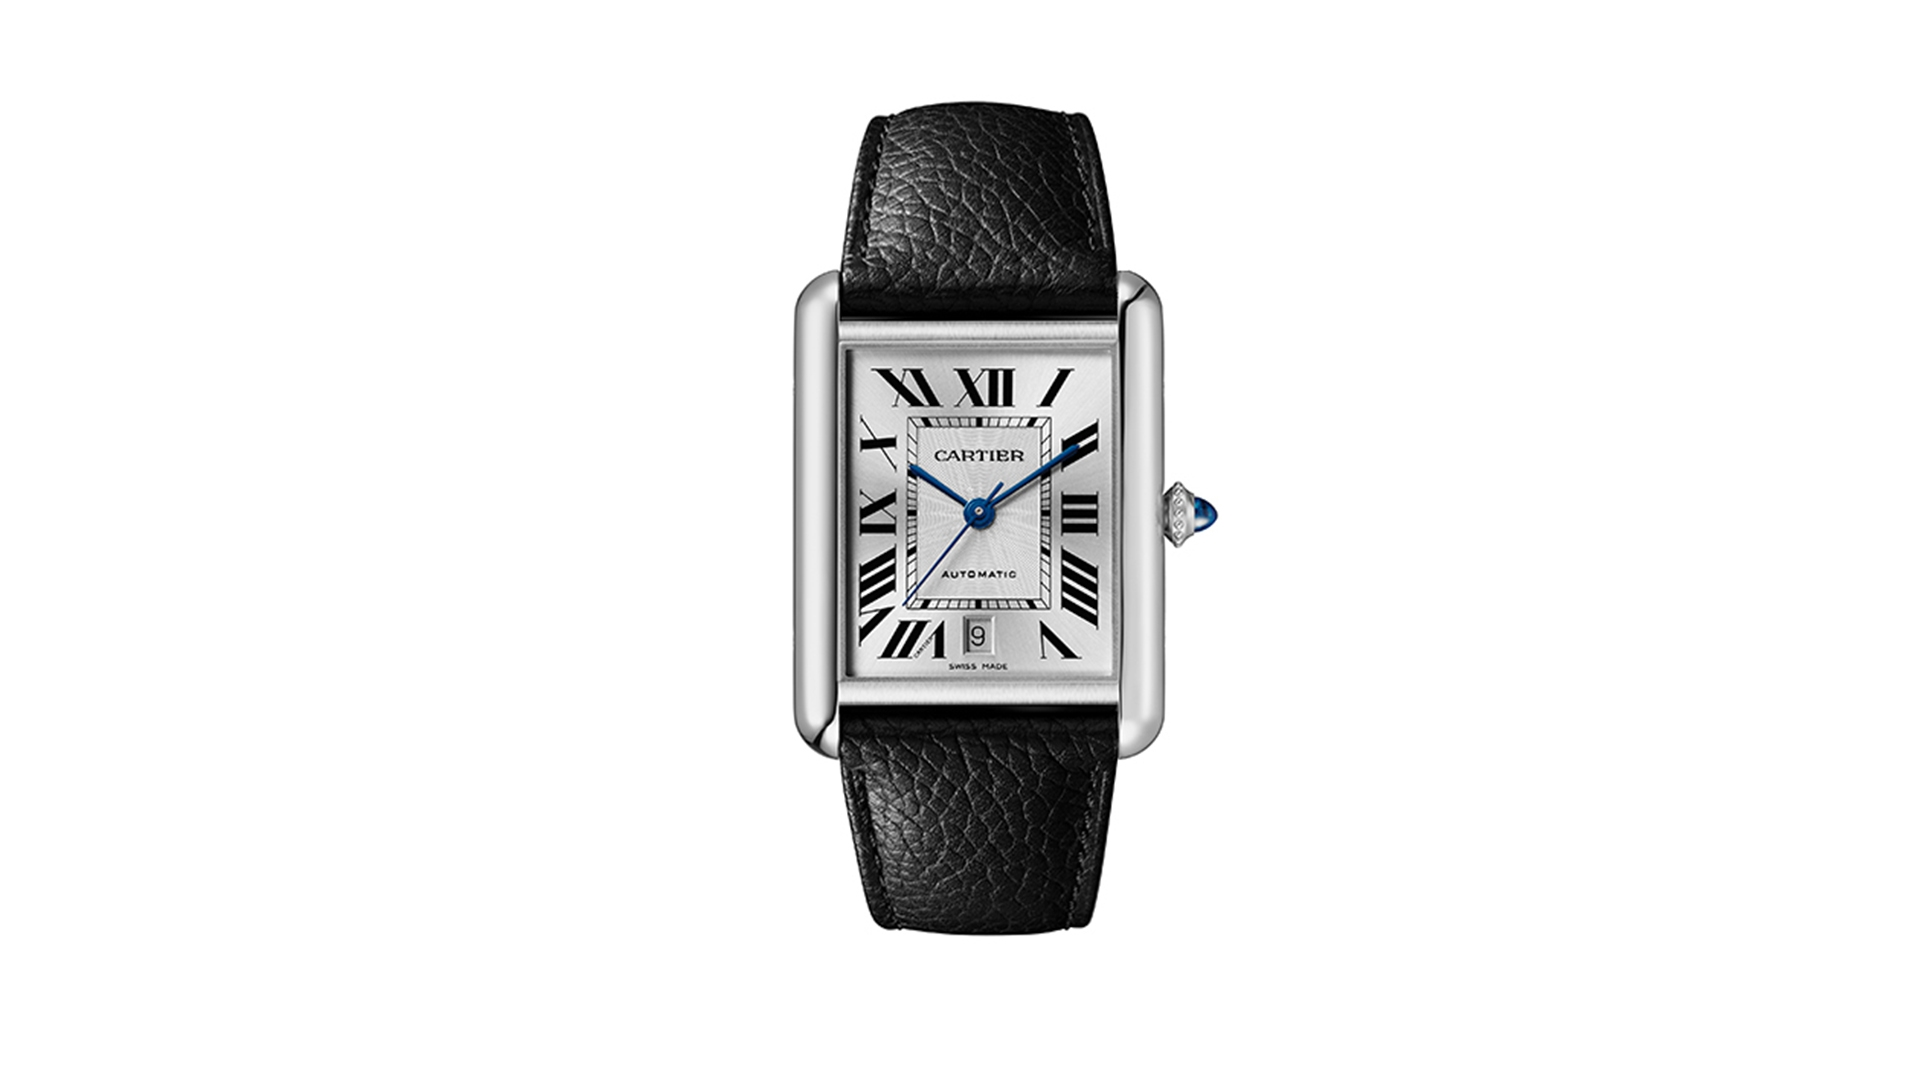 Cartier no deja atrás a su icónico reloj Tank Must